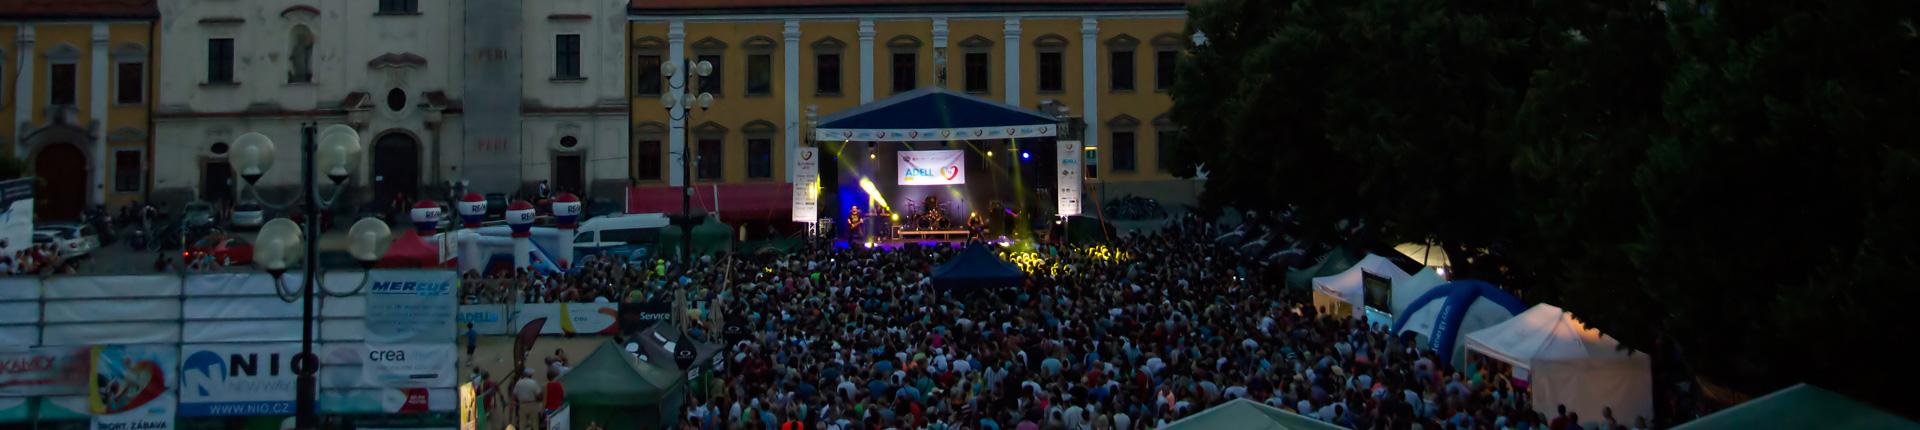 TOP SONG Slováckého léta 2016